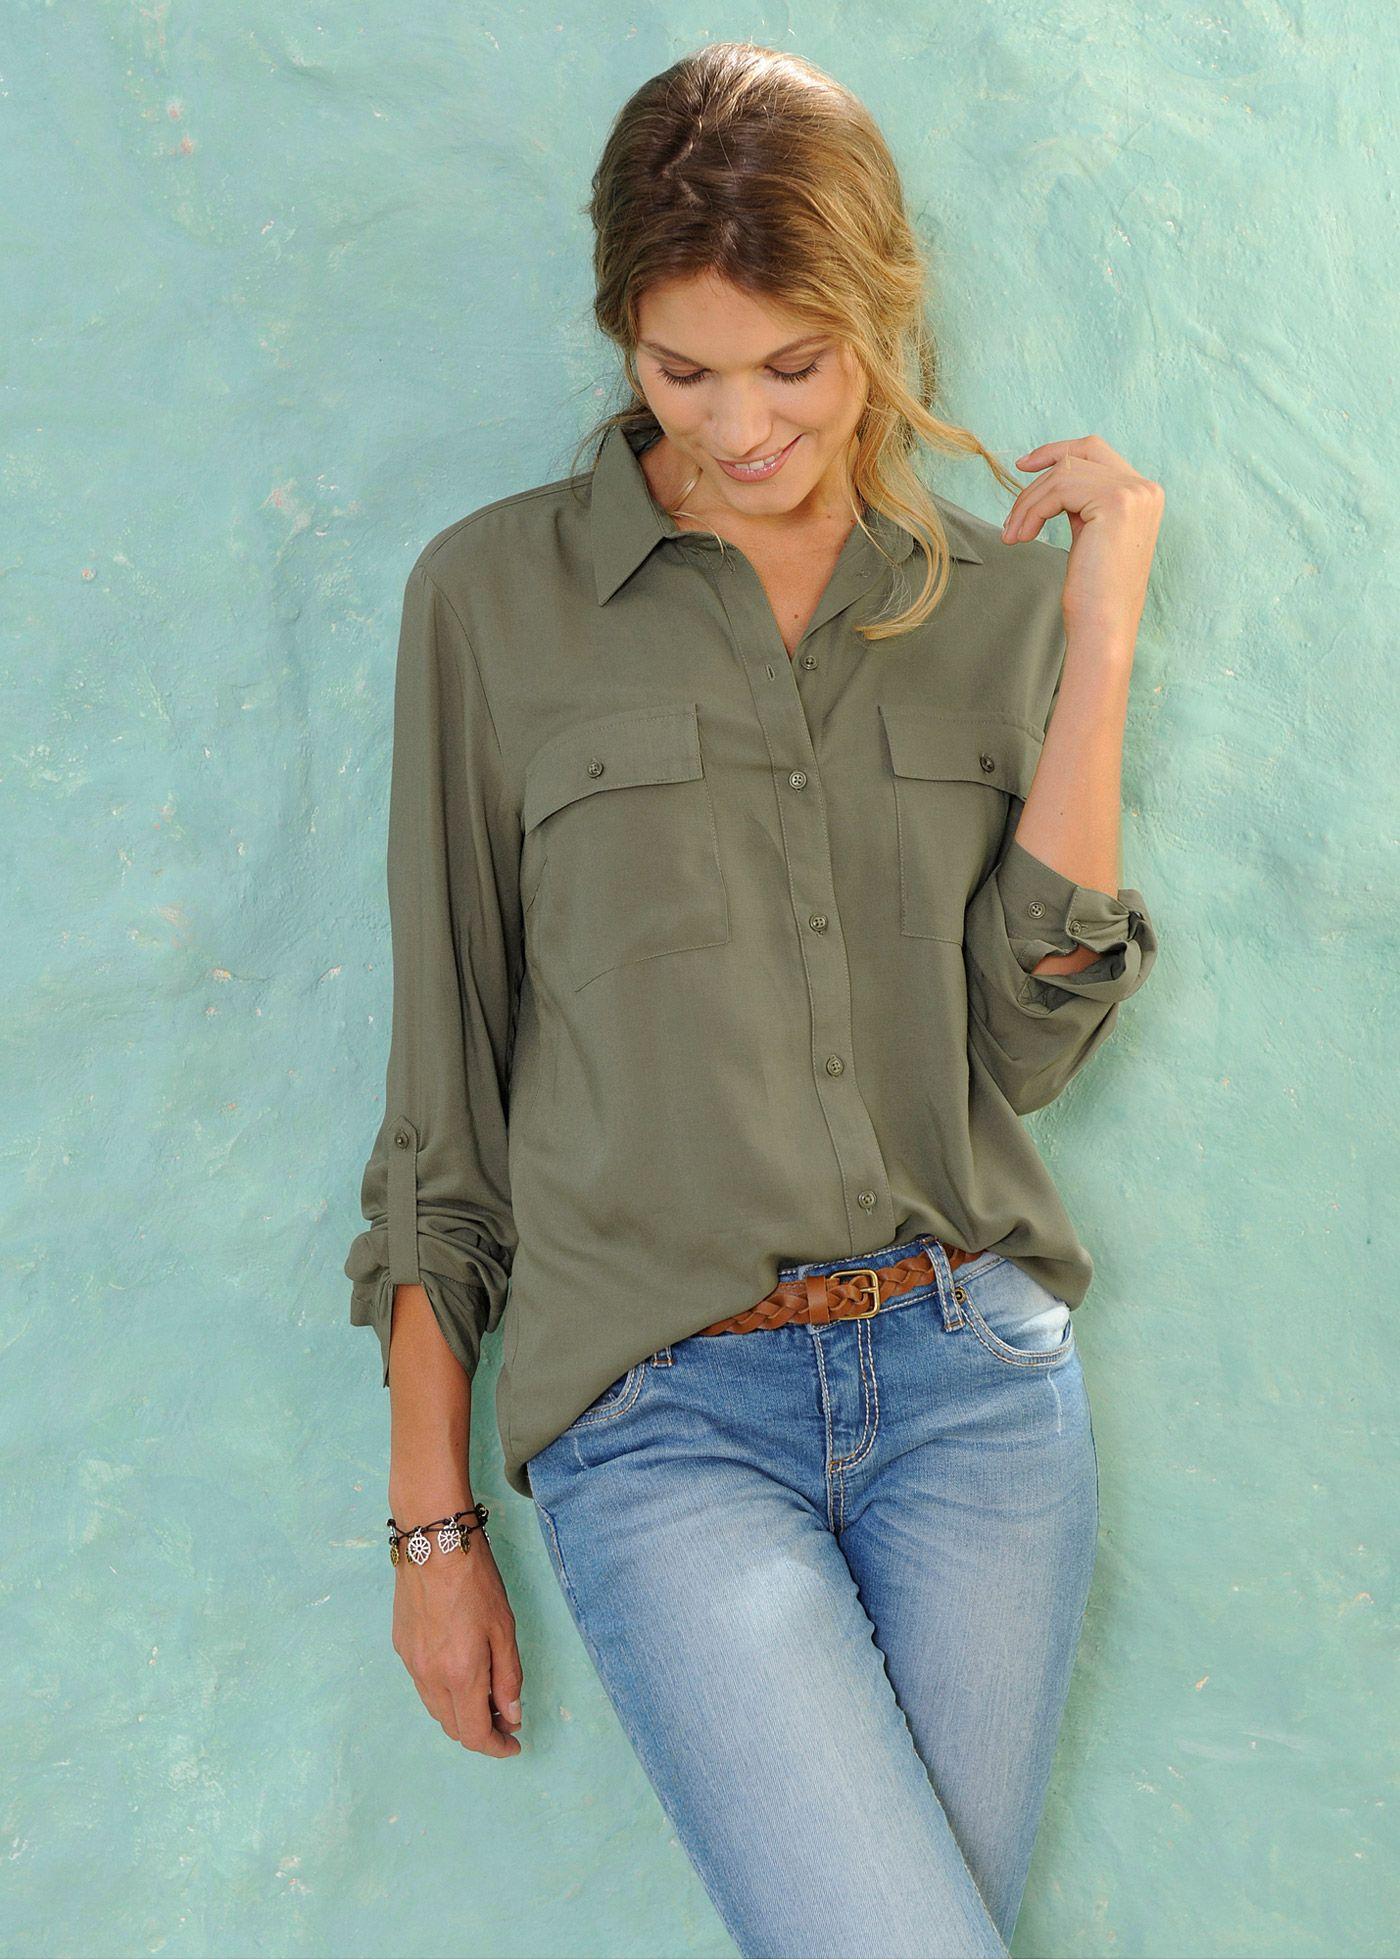 6ec00519c Camisa manga longa cru - Moda Feminina - bonprix.de | Blusas e ...